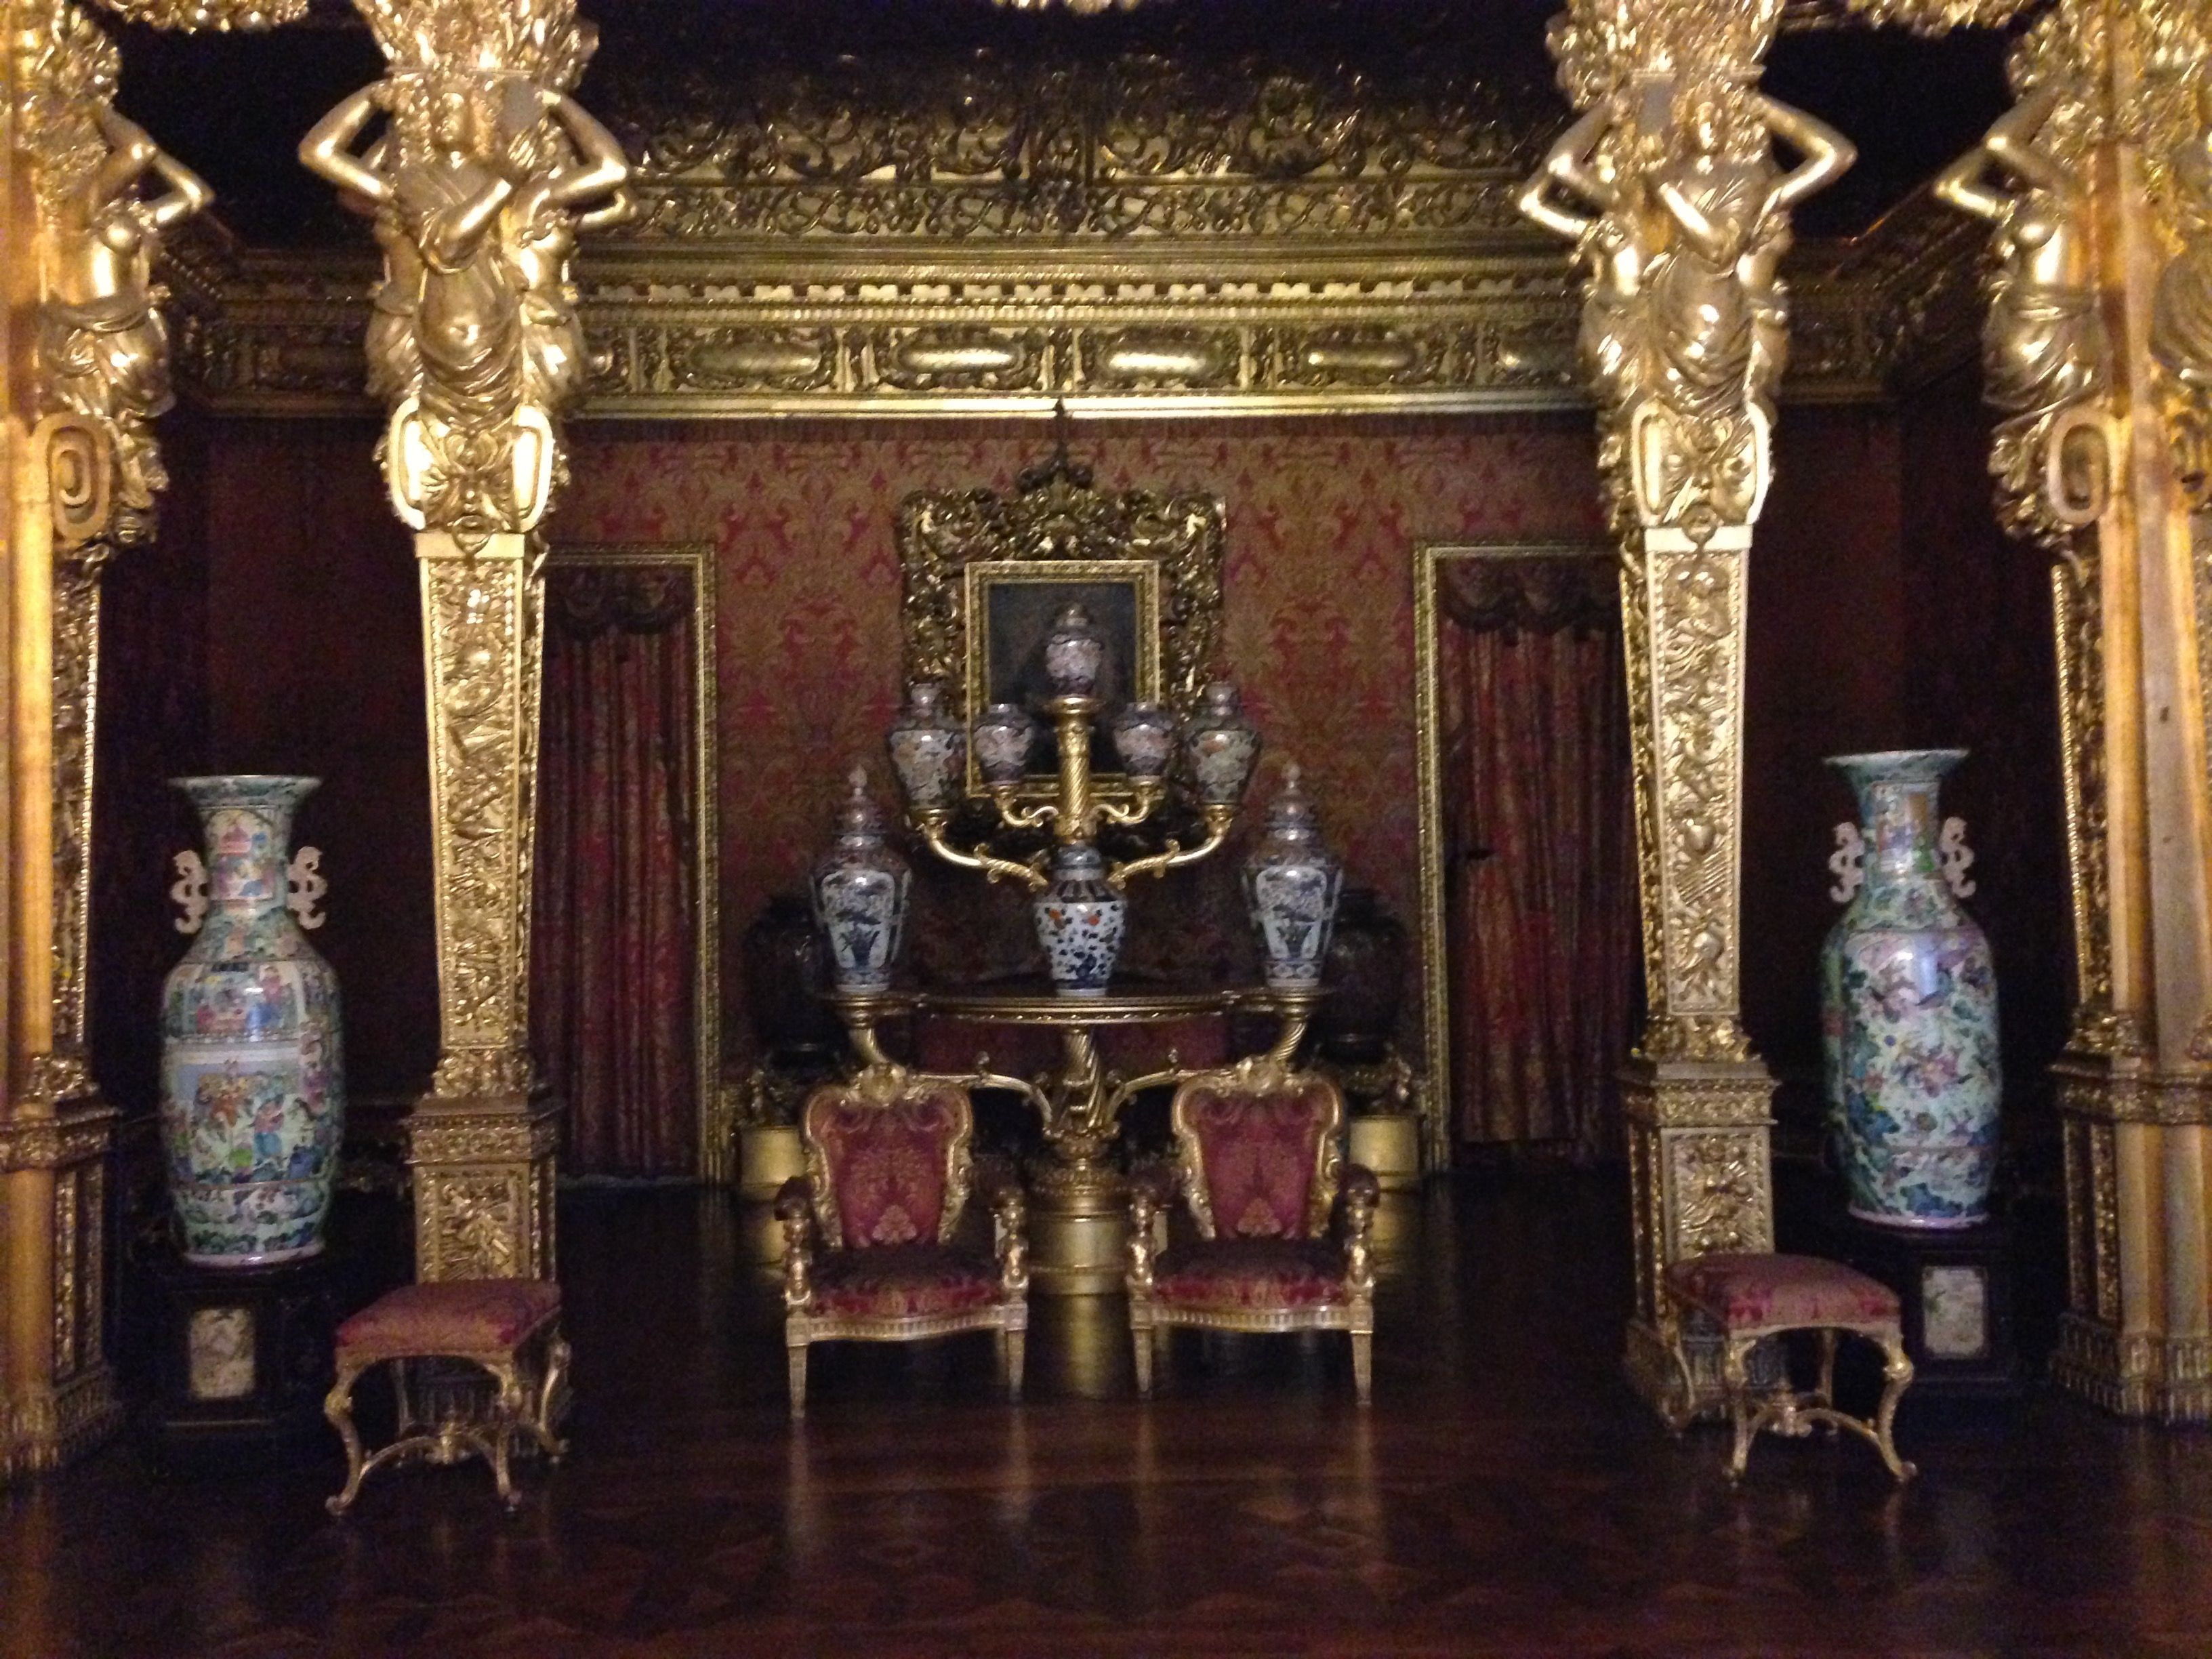 Schlafzimmerschrank erle ~ Royal palace interior torino italy 23 4 2016 castles